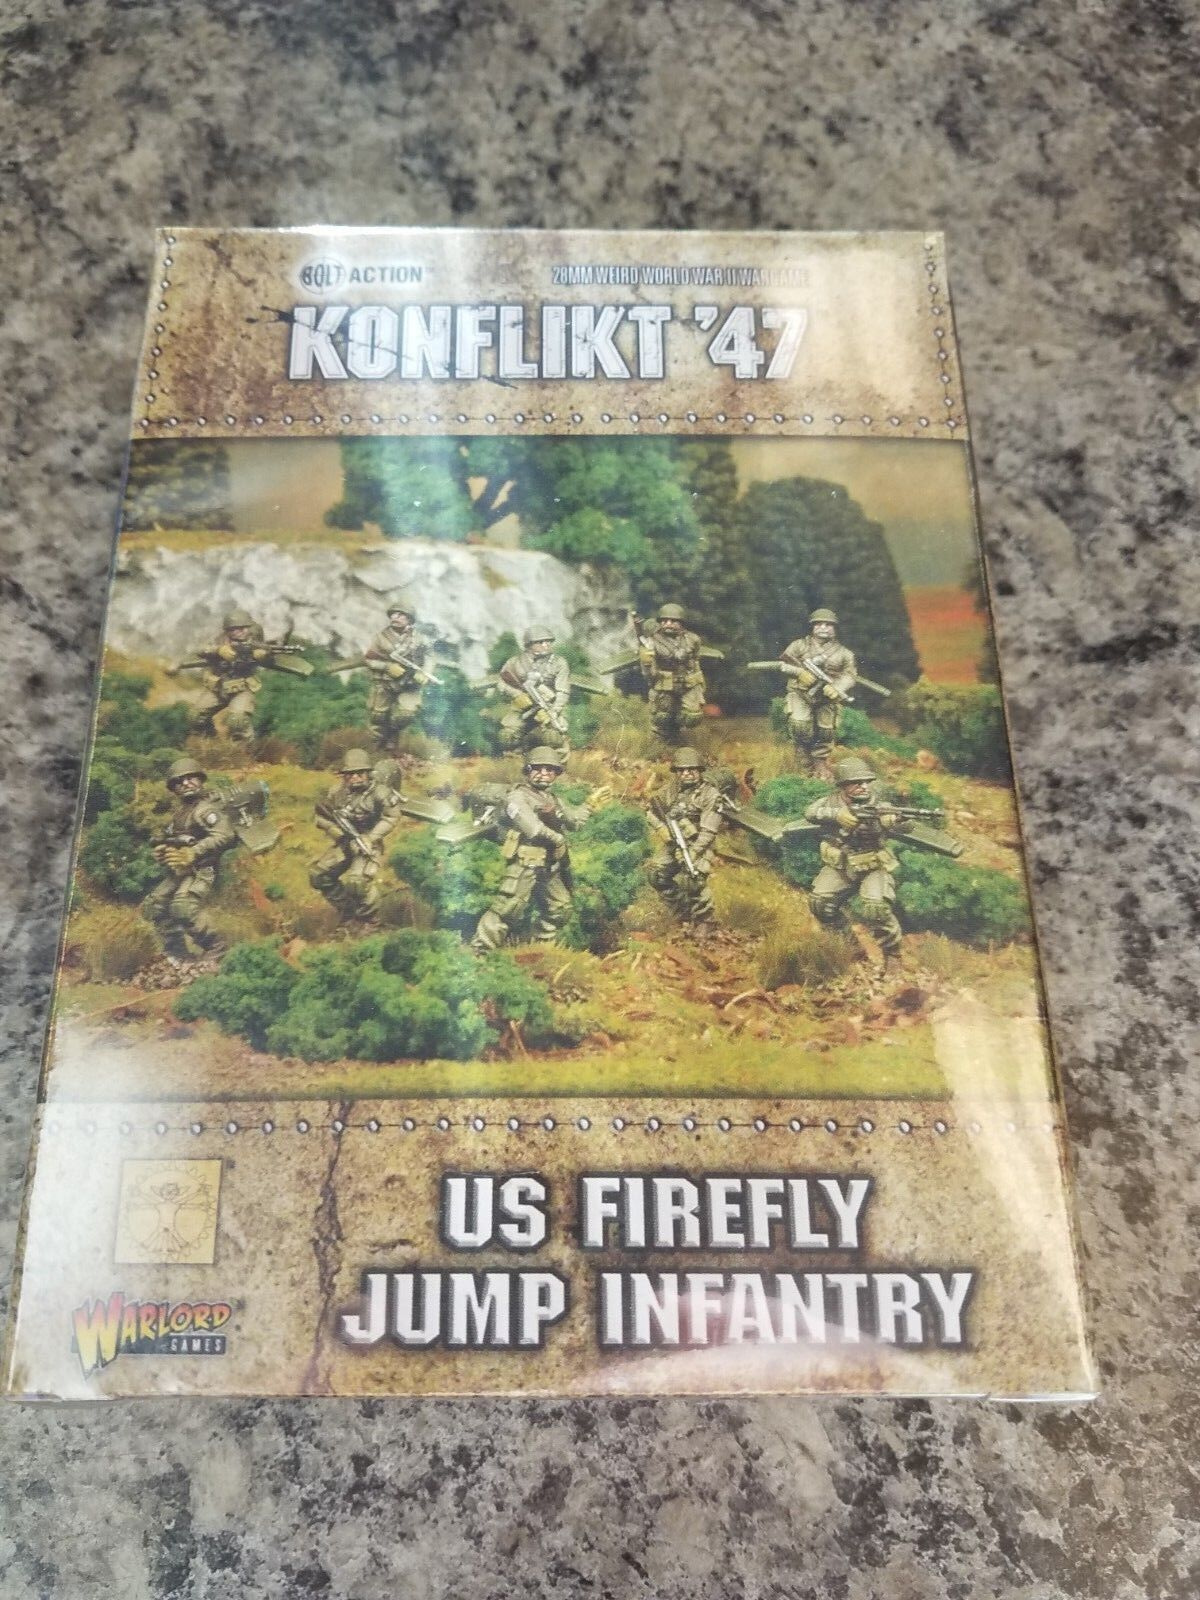 Firefly Springen Infanterie Us Army Konflikt '47 Warlord Games Modell Neu